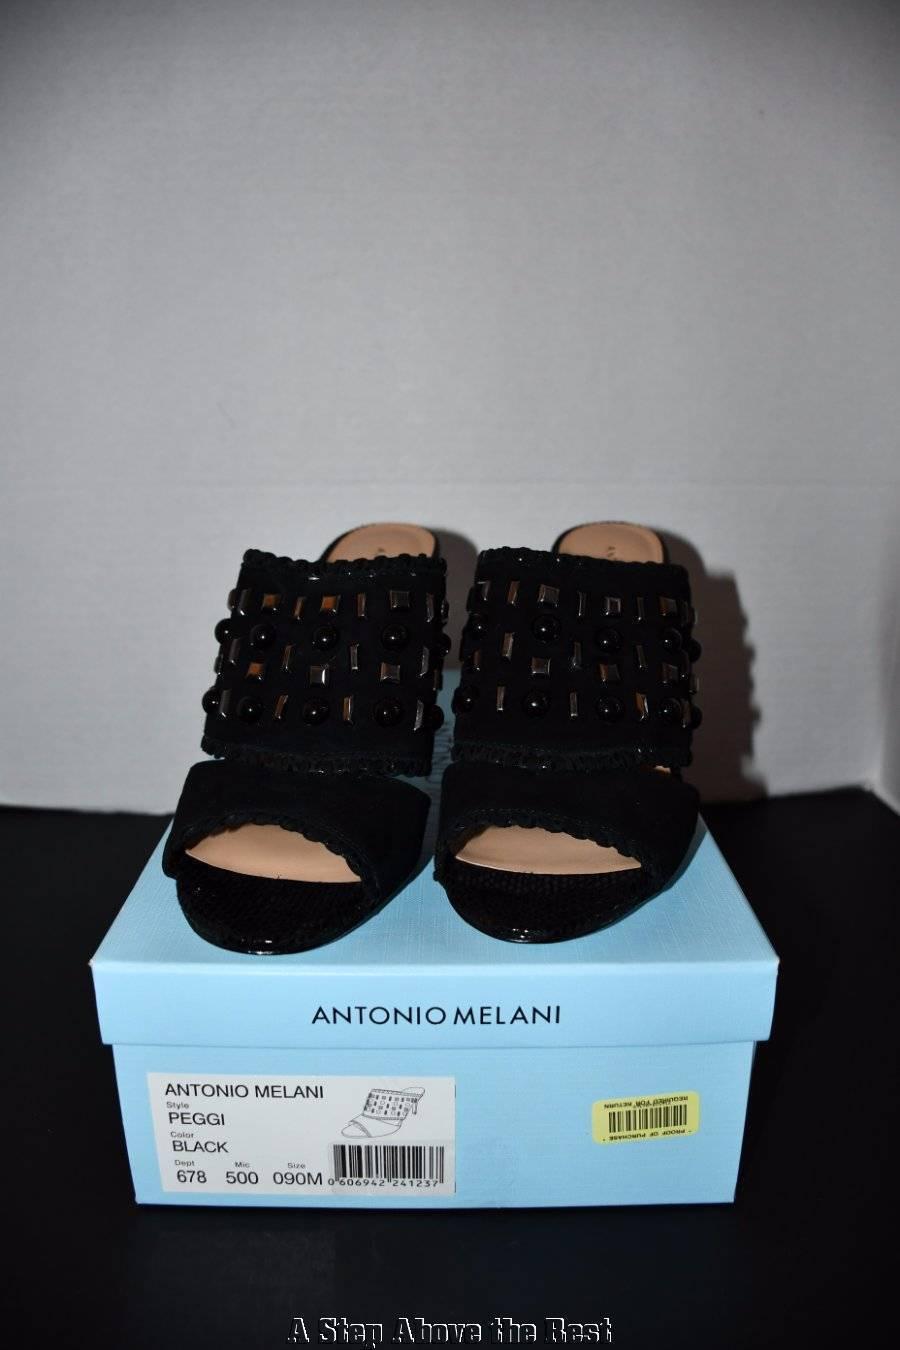 Antonio Melani Peggi Studded Leather Peep Toe Dress Mules Size 9M NIB